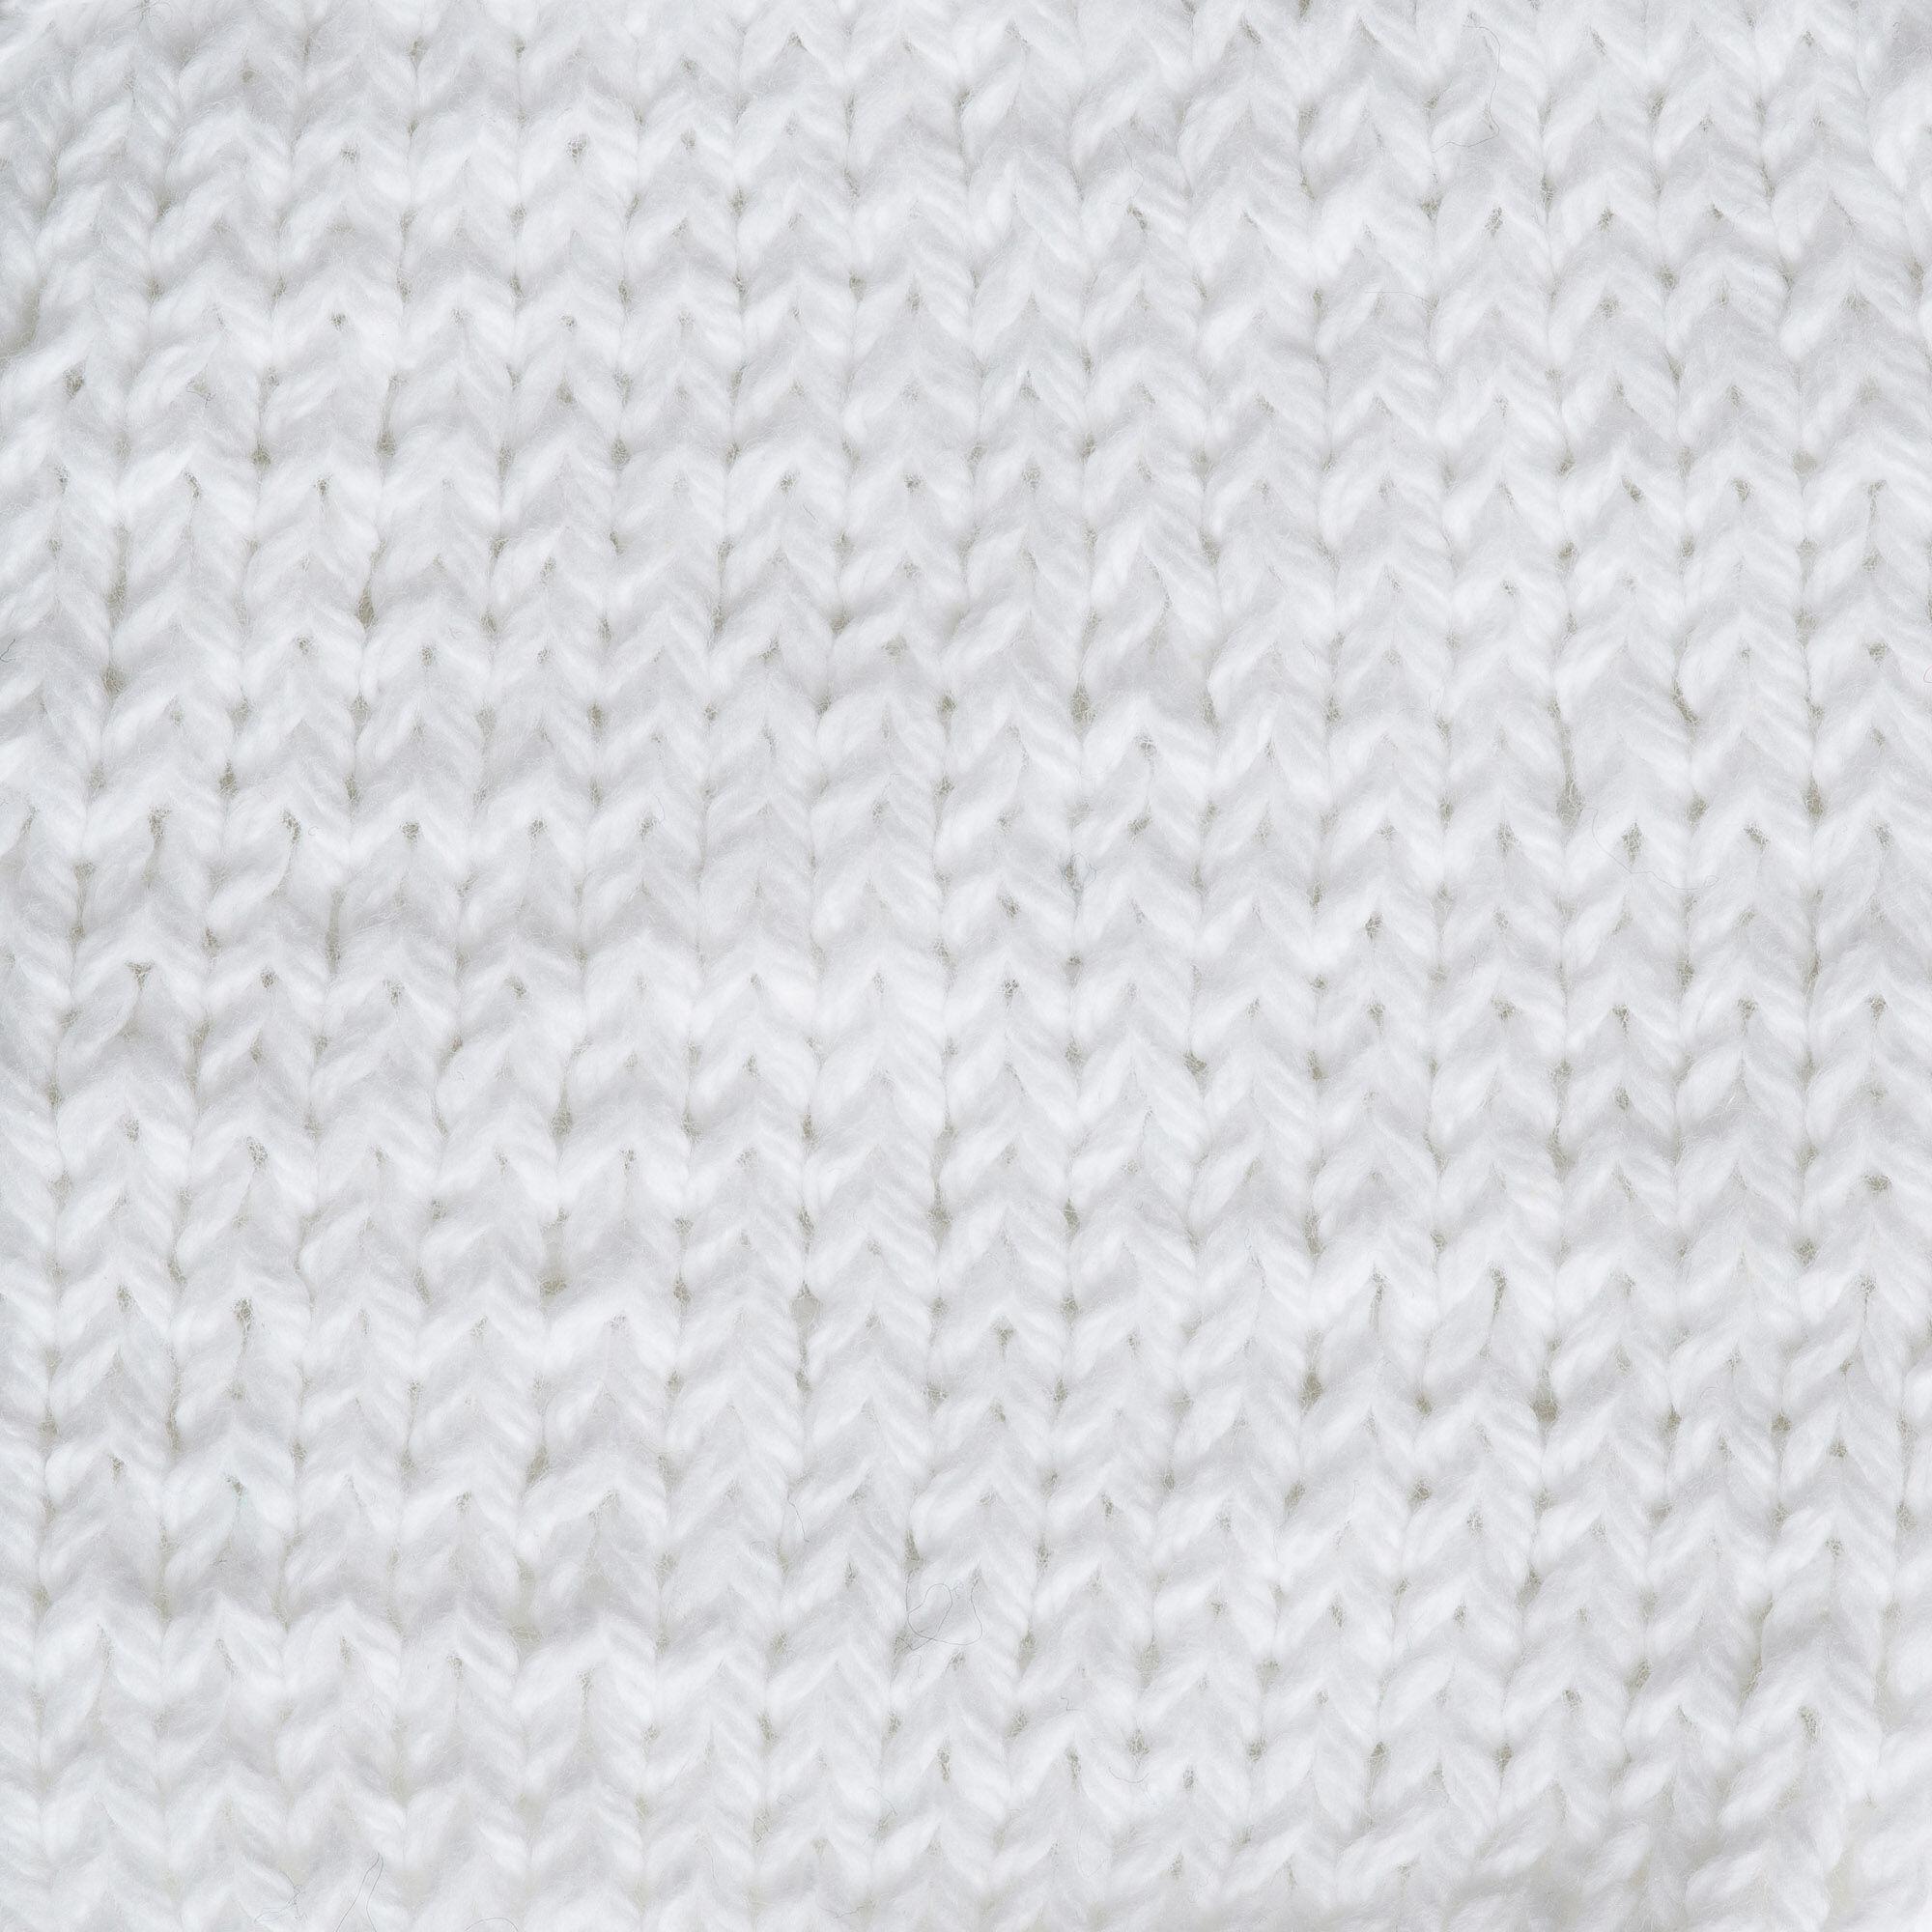 Lily Sugar/' n Cream 2 oz Ombre COOL BREEZE Knit Crochet Cotton Yarn